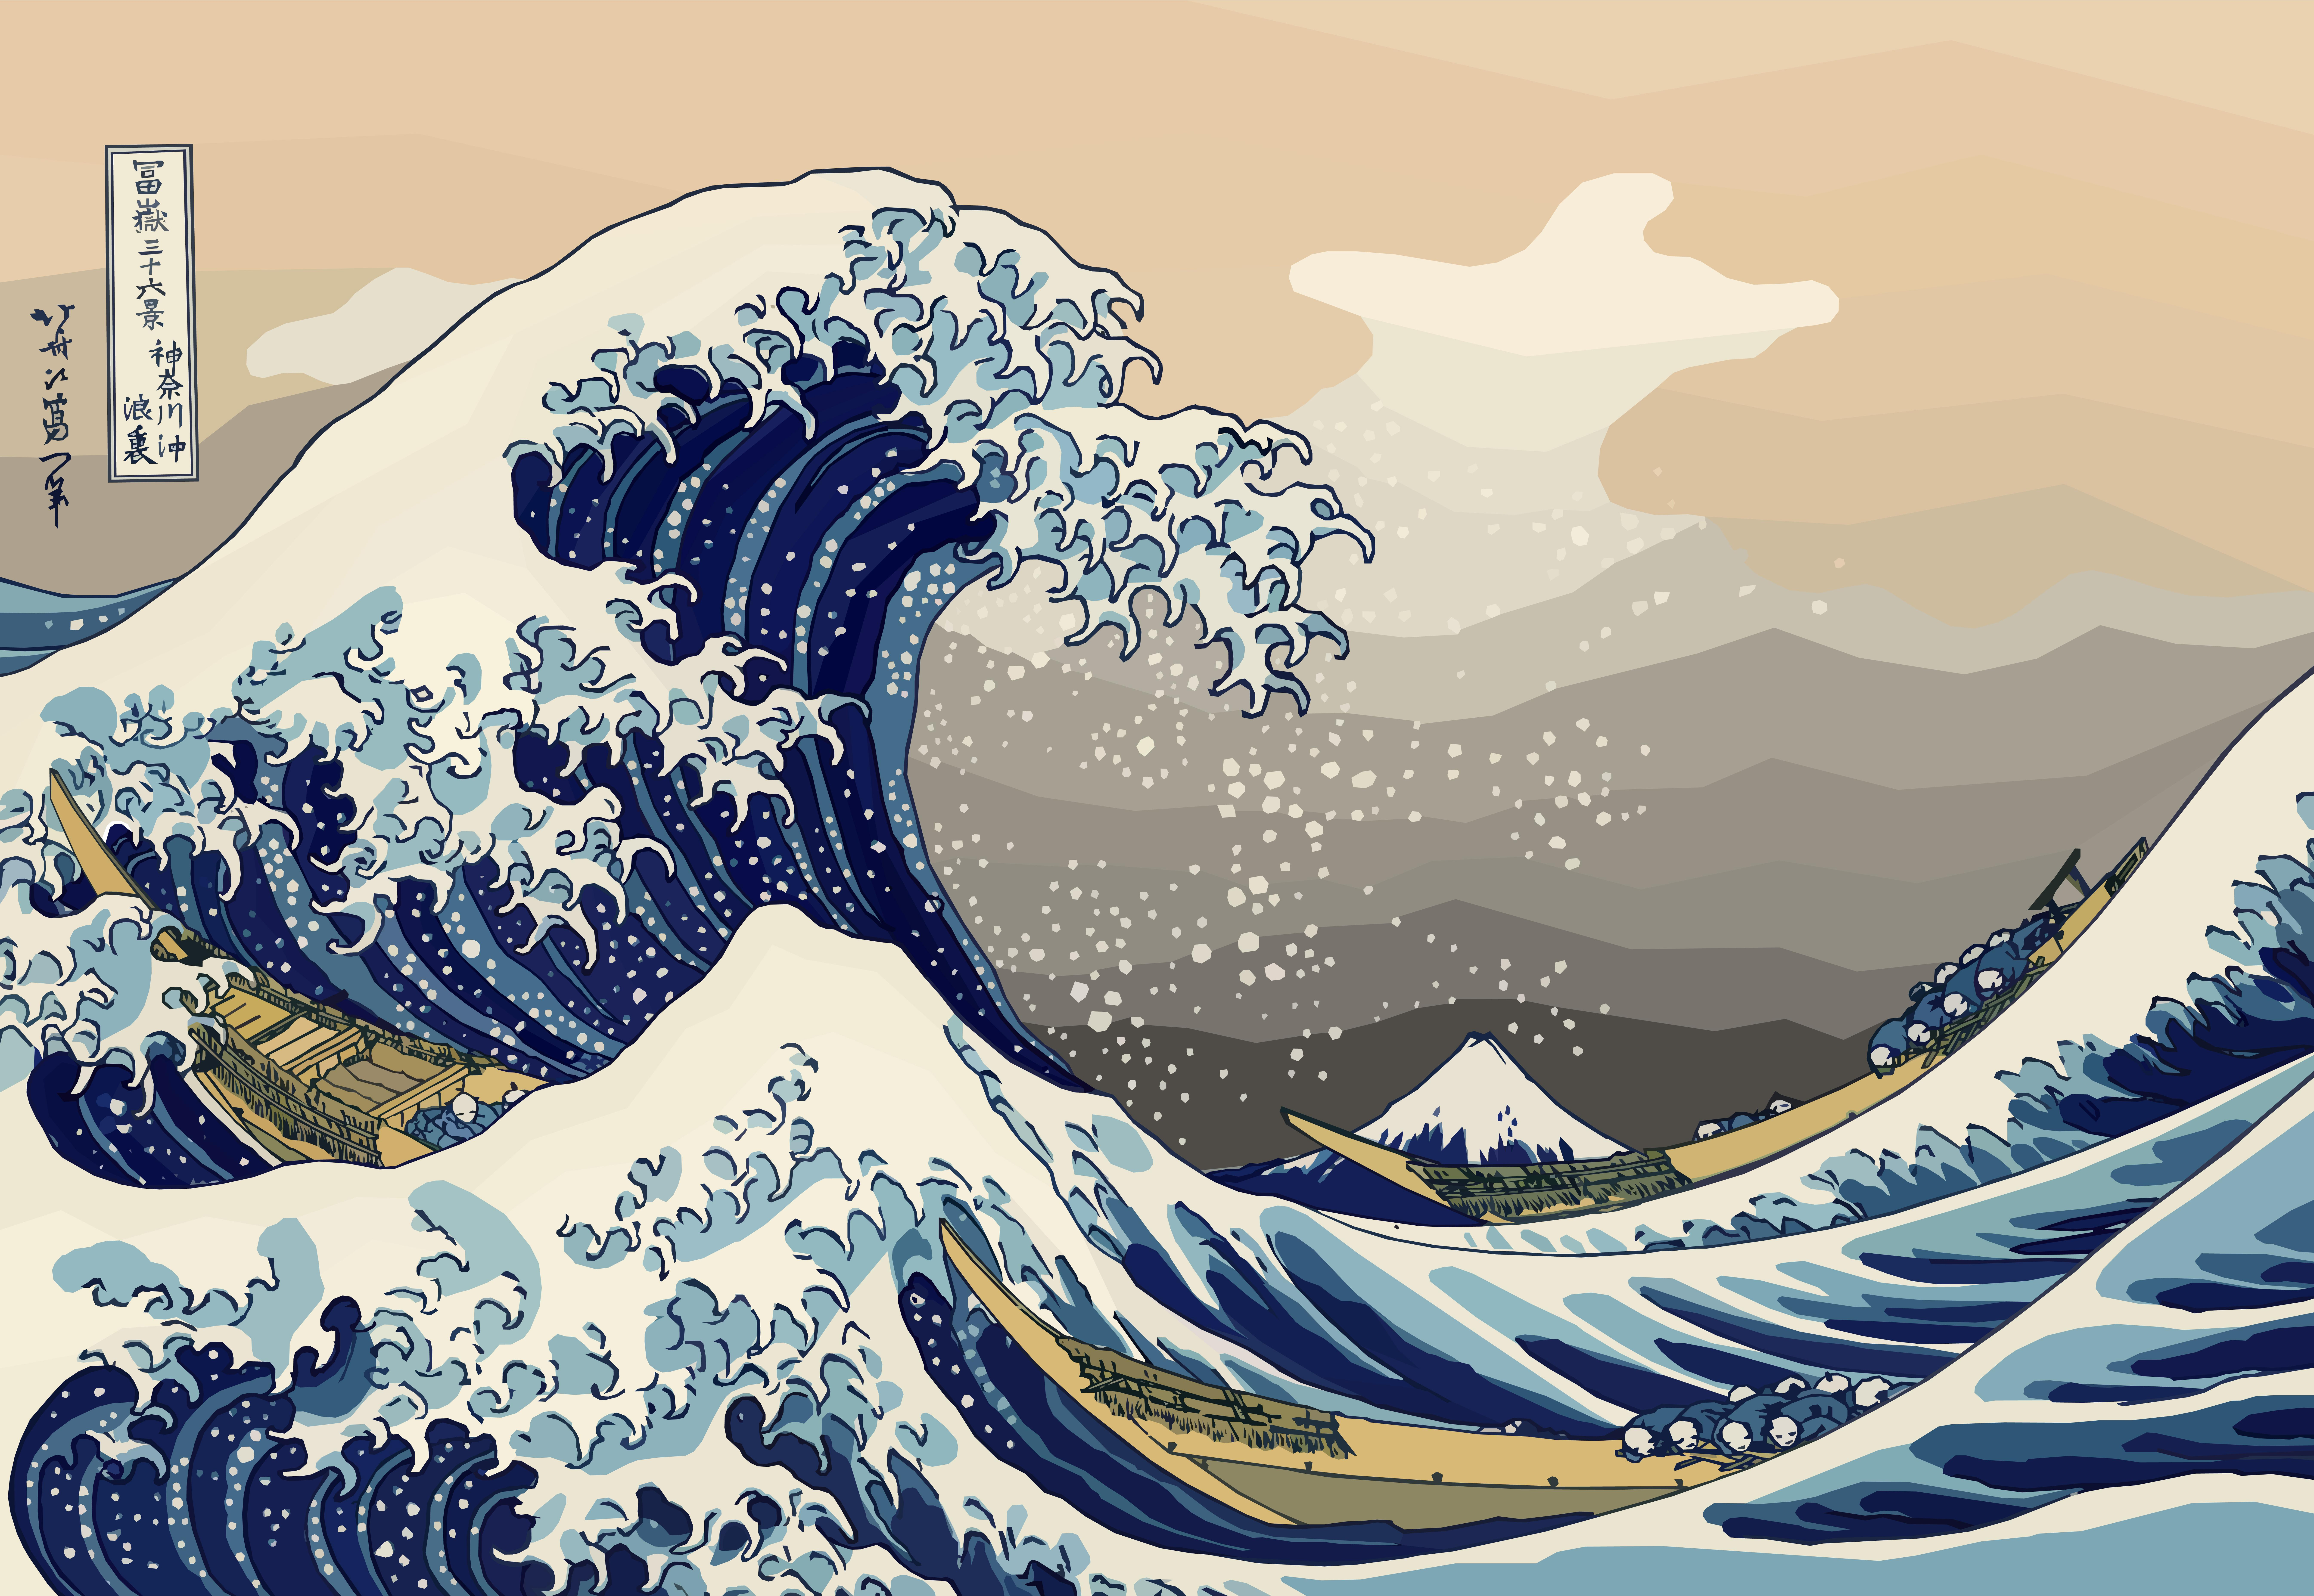 The Great Wave, by Katsushika Hokusai.